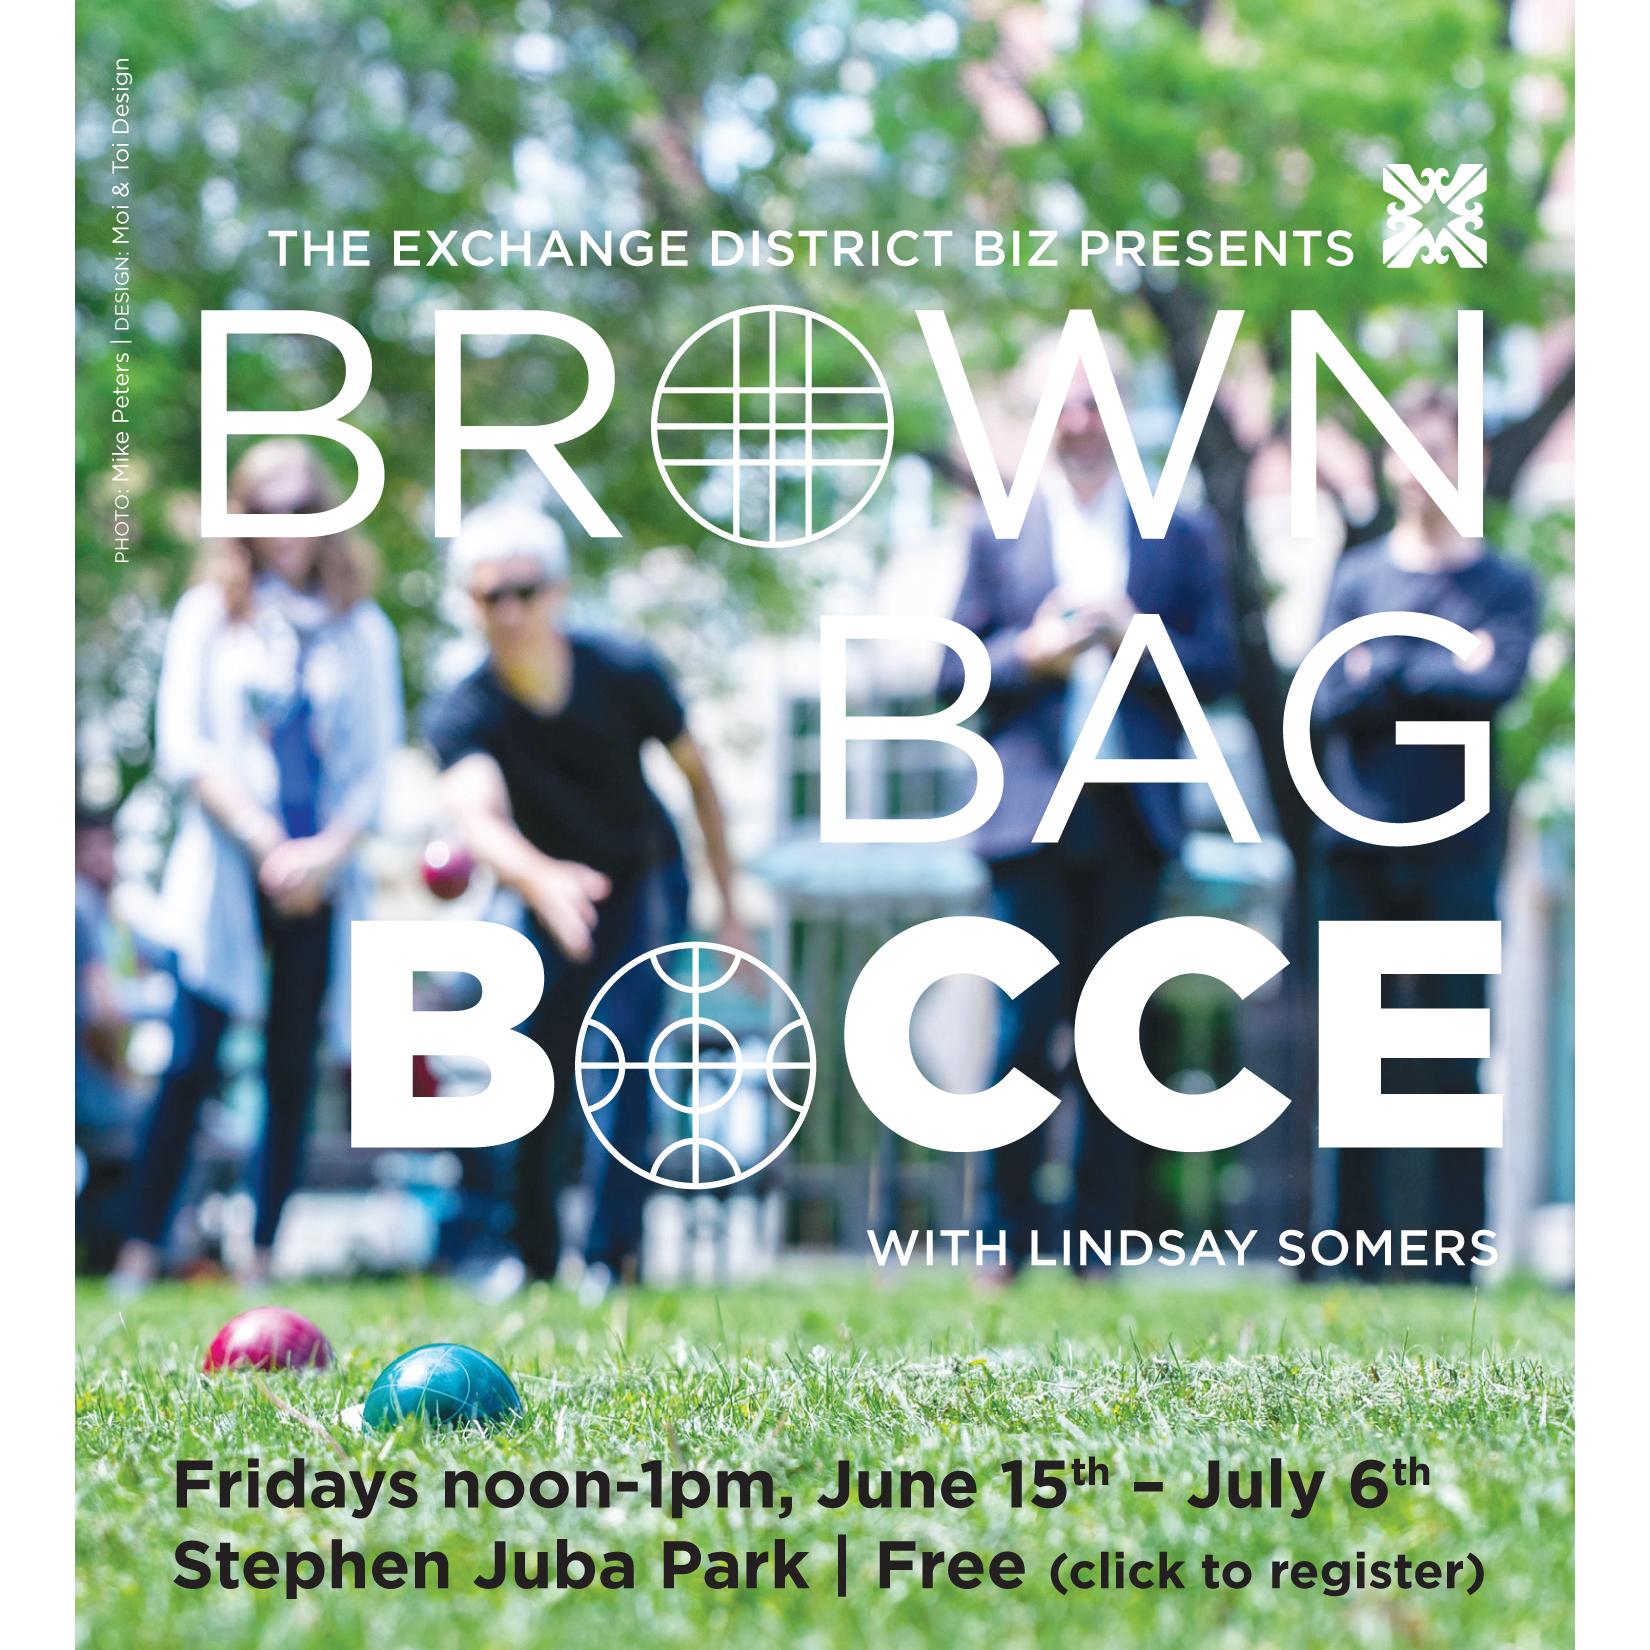 BrownBagBocce_2018_PromoPostcard-1.jpg